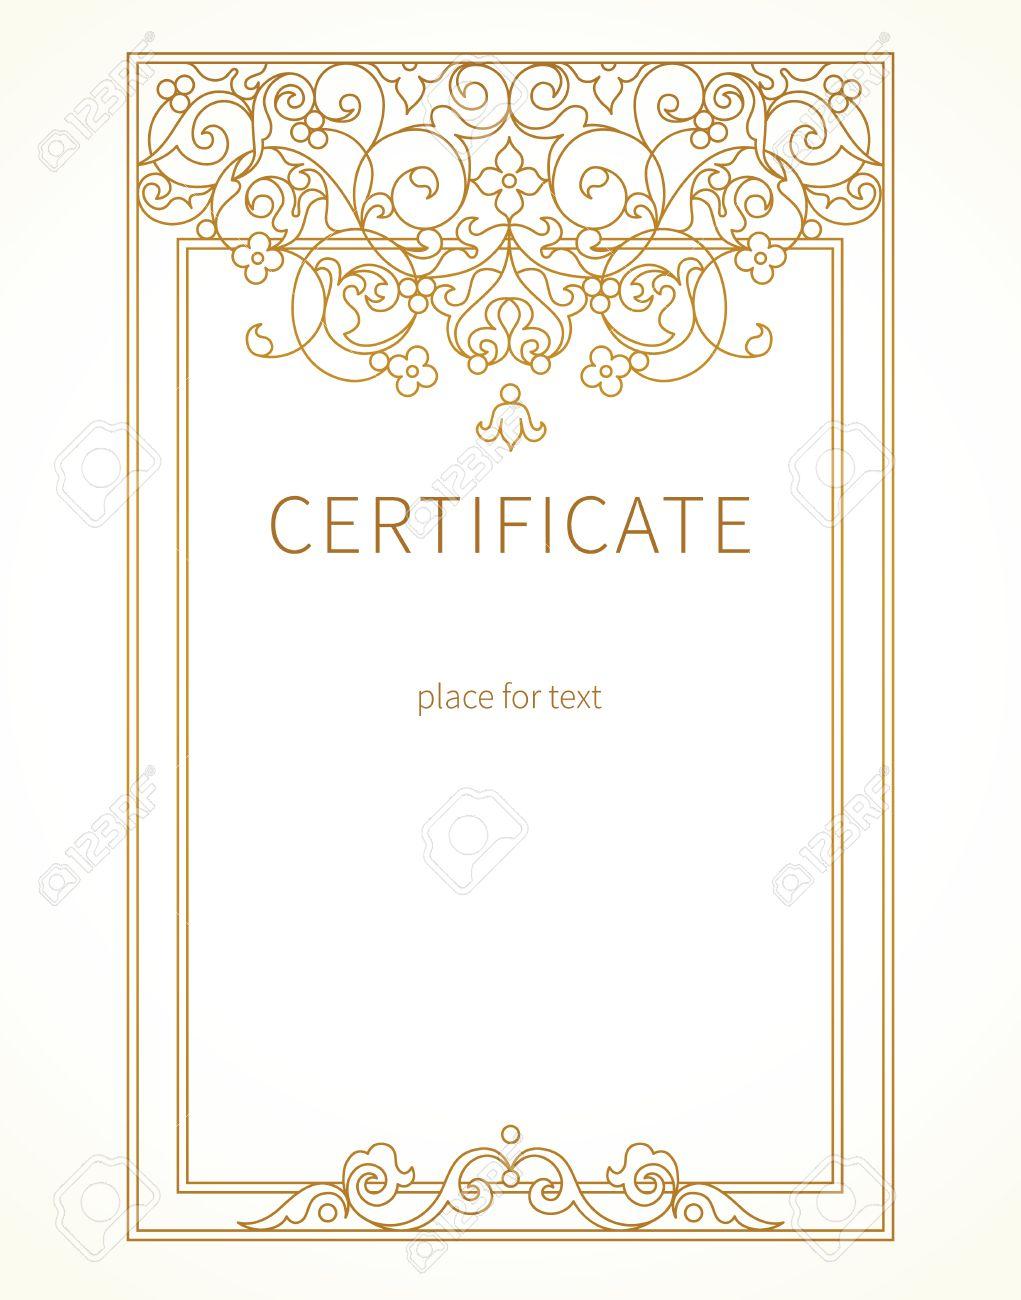 Wunderbar Geburtstag Zertifikatvorlage Fotos - Entry Level Resume ...